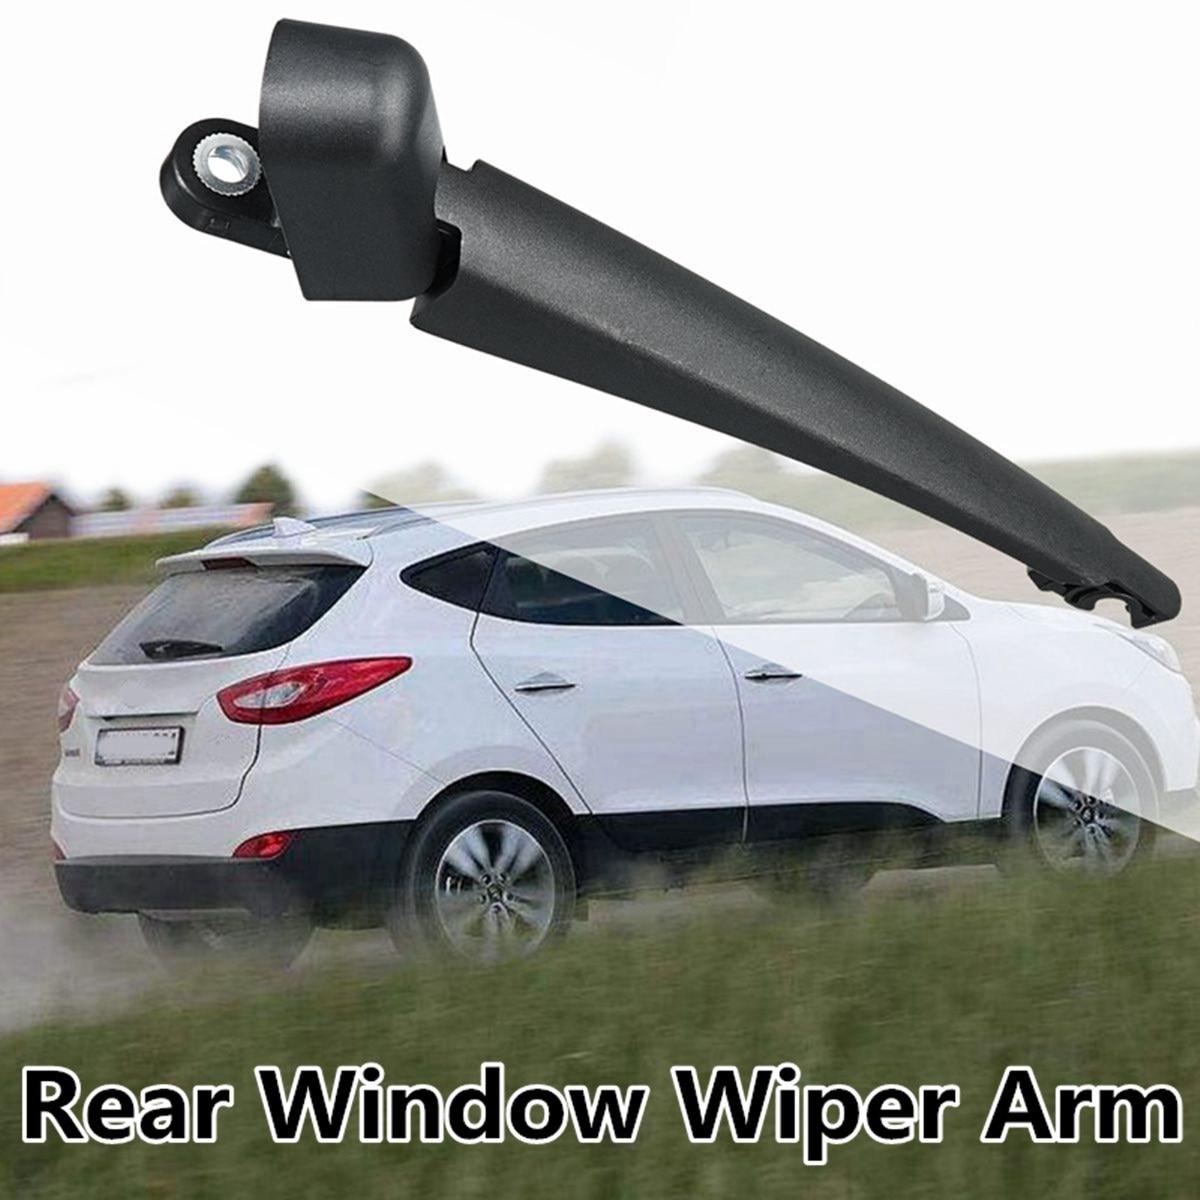 1Pcs Rear Window Windscreen Wiper Arm & Cap For Hyundai Tucson ix / ix35 2010-2015 988111H000